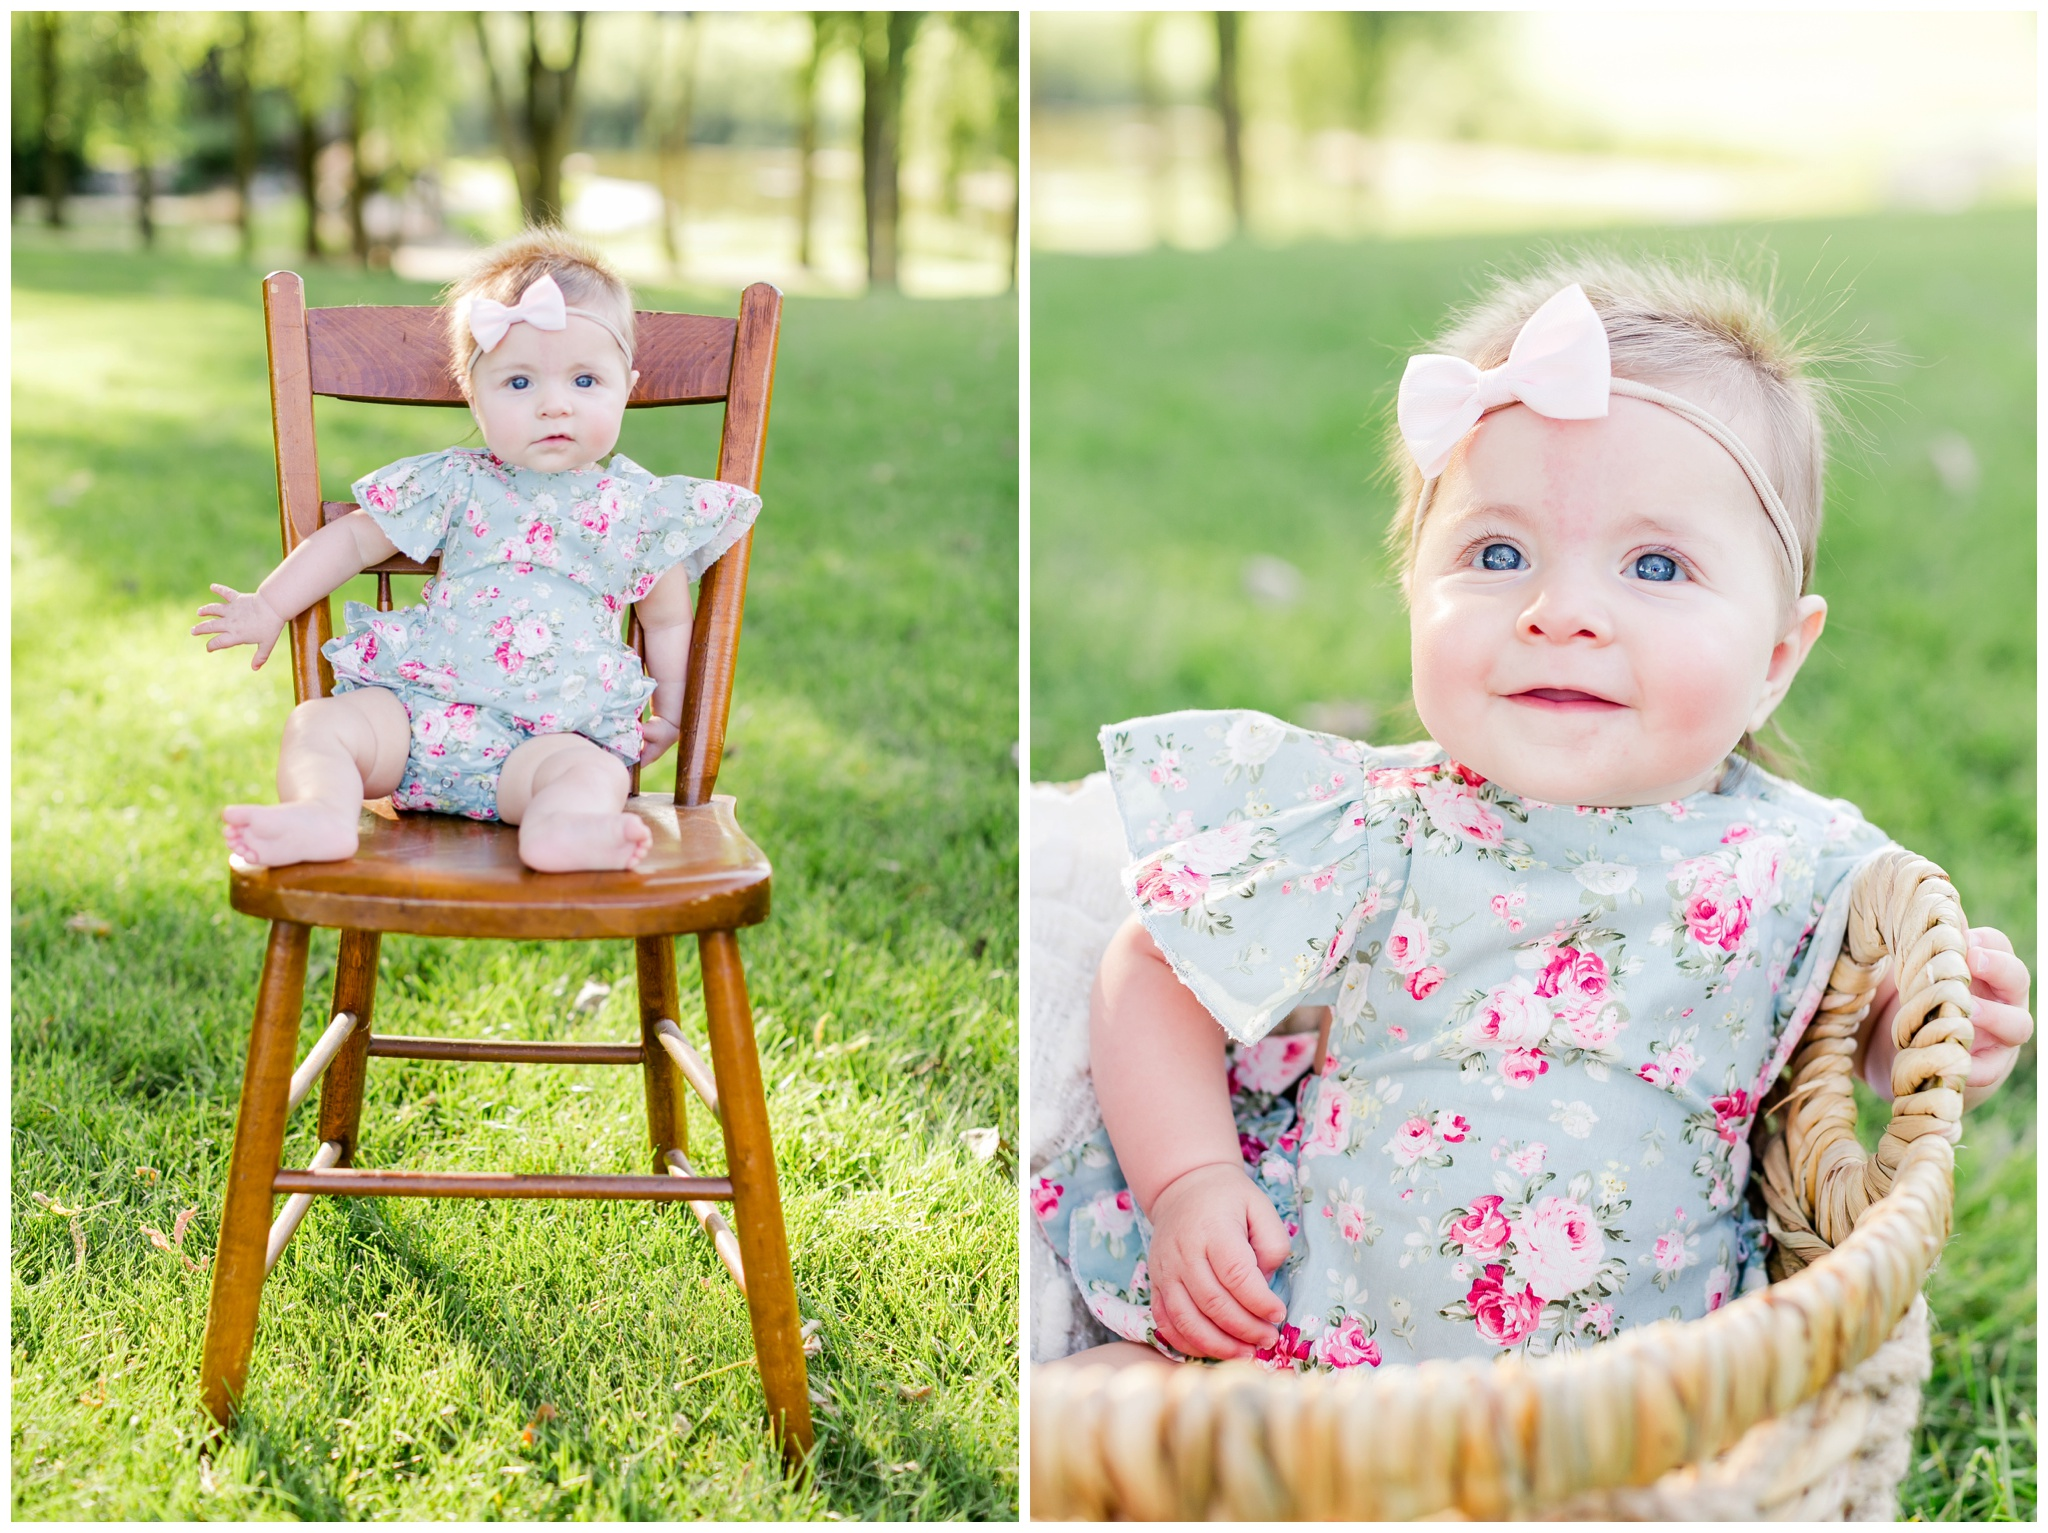 burke_park_family_session_madison_wisconsin_portrait_photographer_4513.jpg